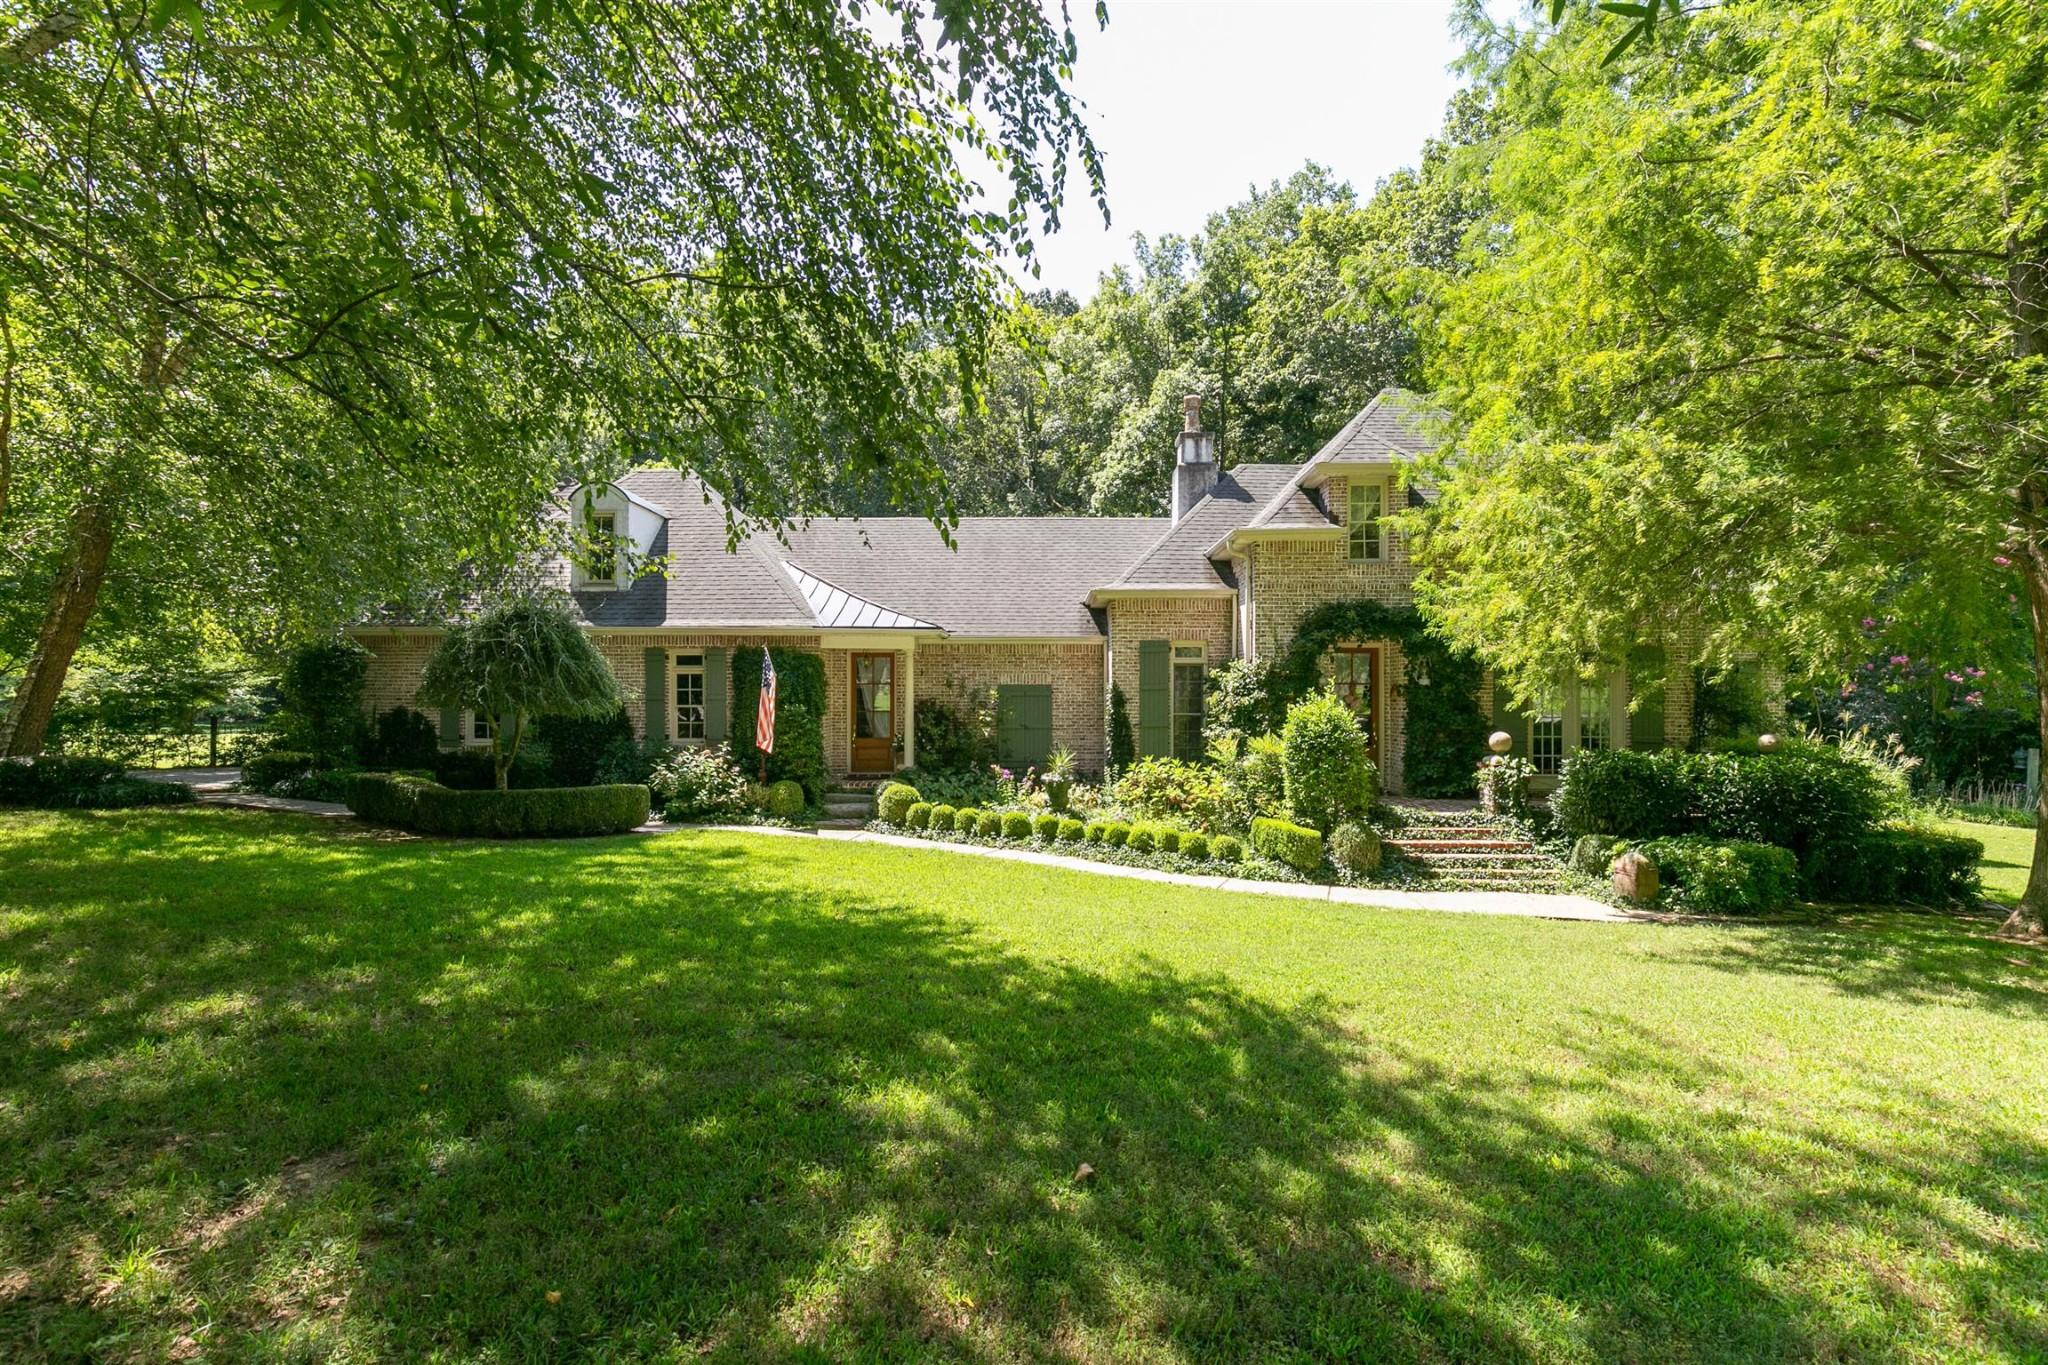 600 Fairway Trl, Springfield, TN 37172 - Springfield, TN real estate listing